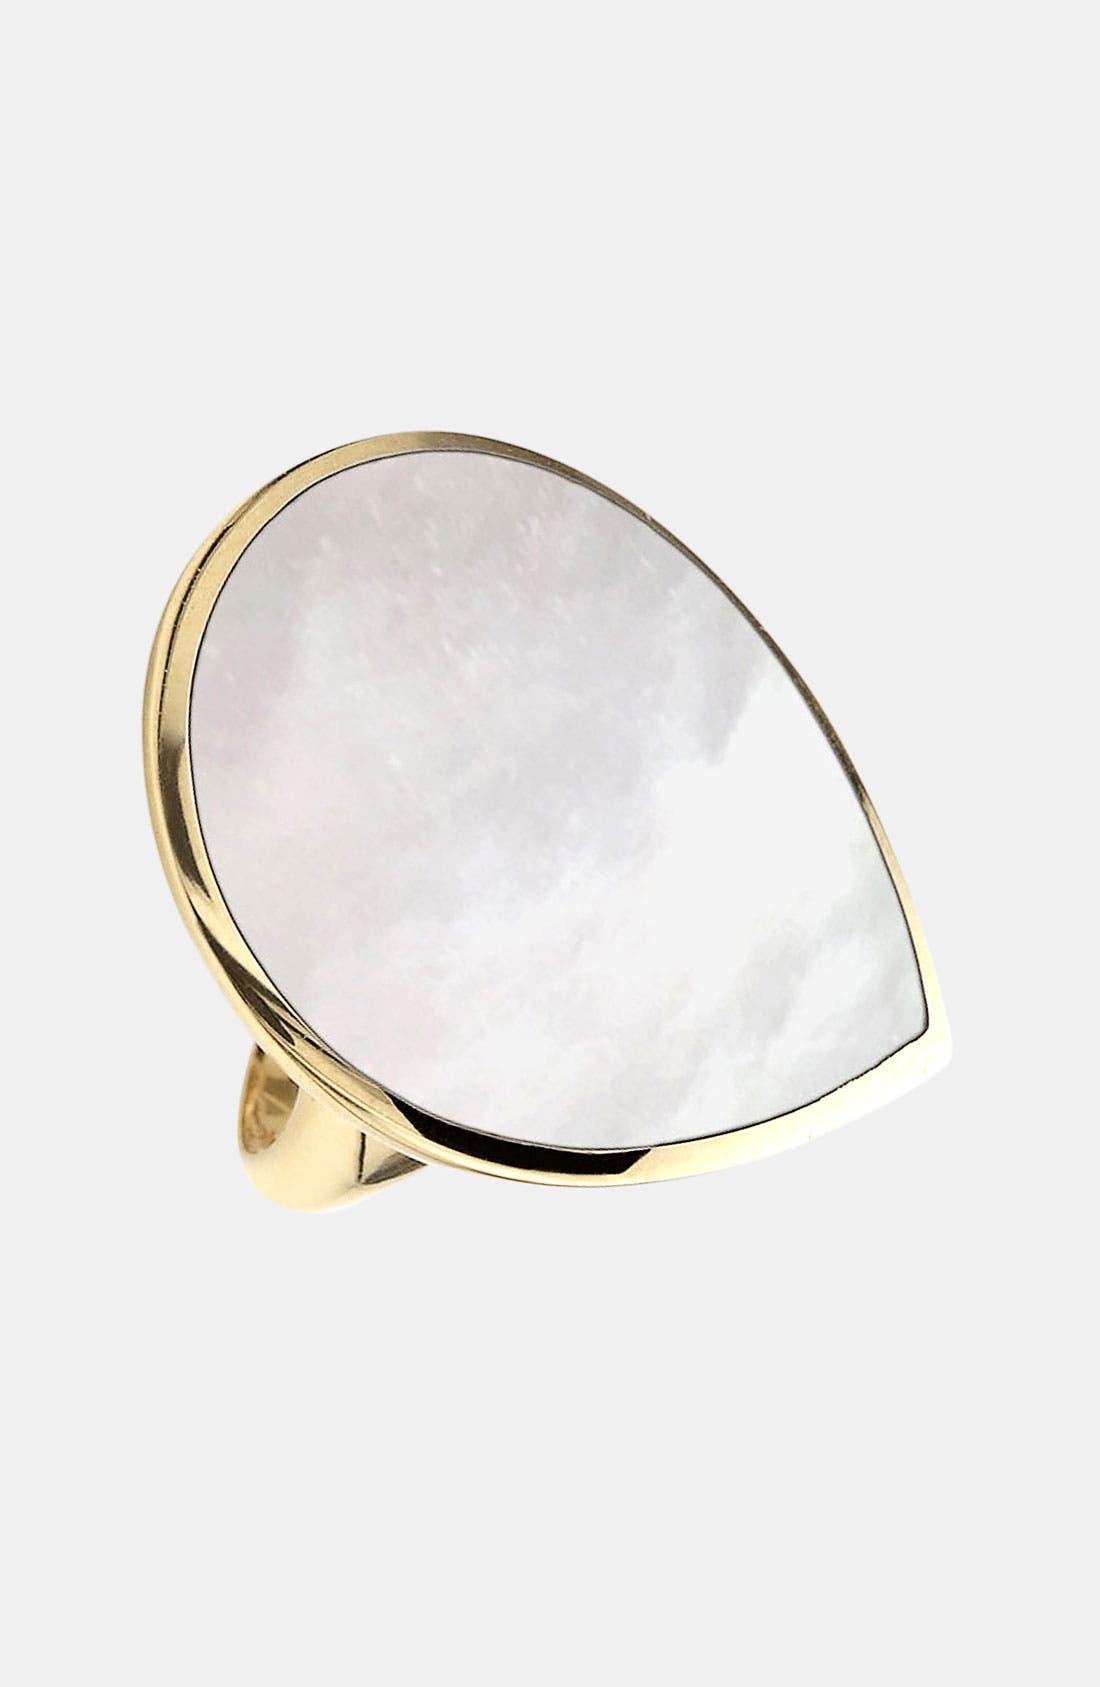 Alternate Image 1 Selected - Ippolita 'Rock Candy' 18k Gold Large Teardrop Ring